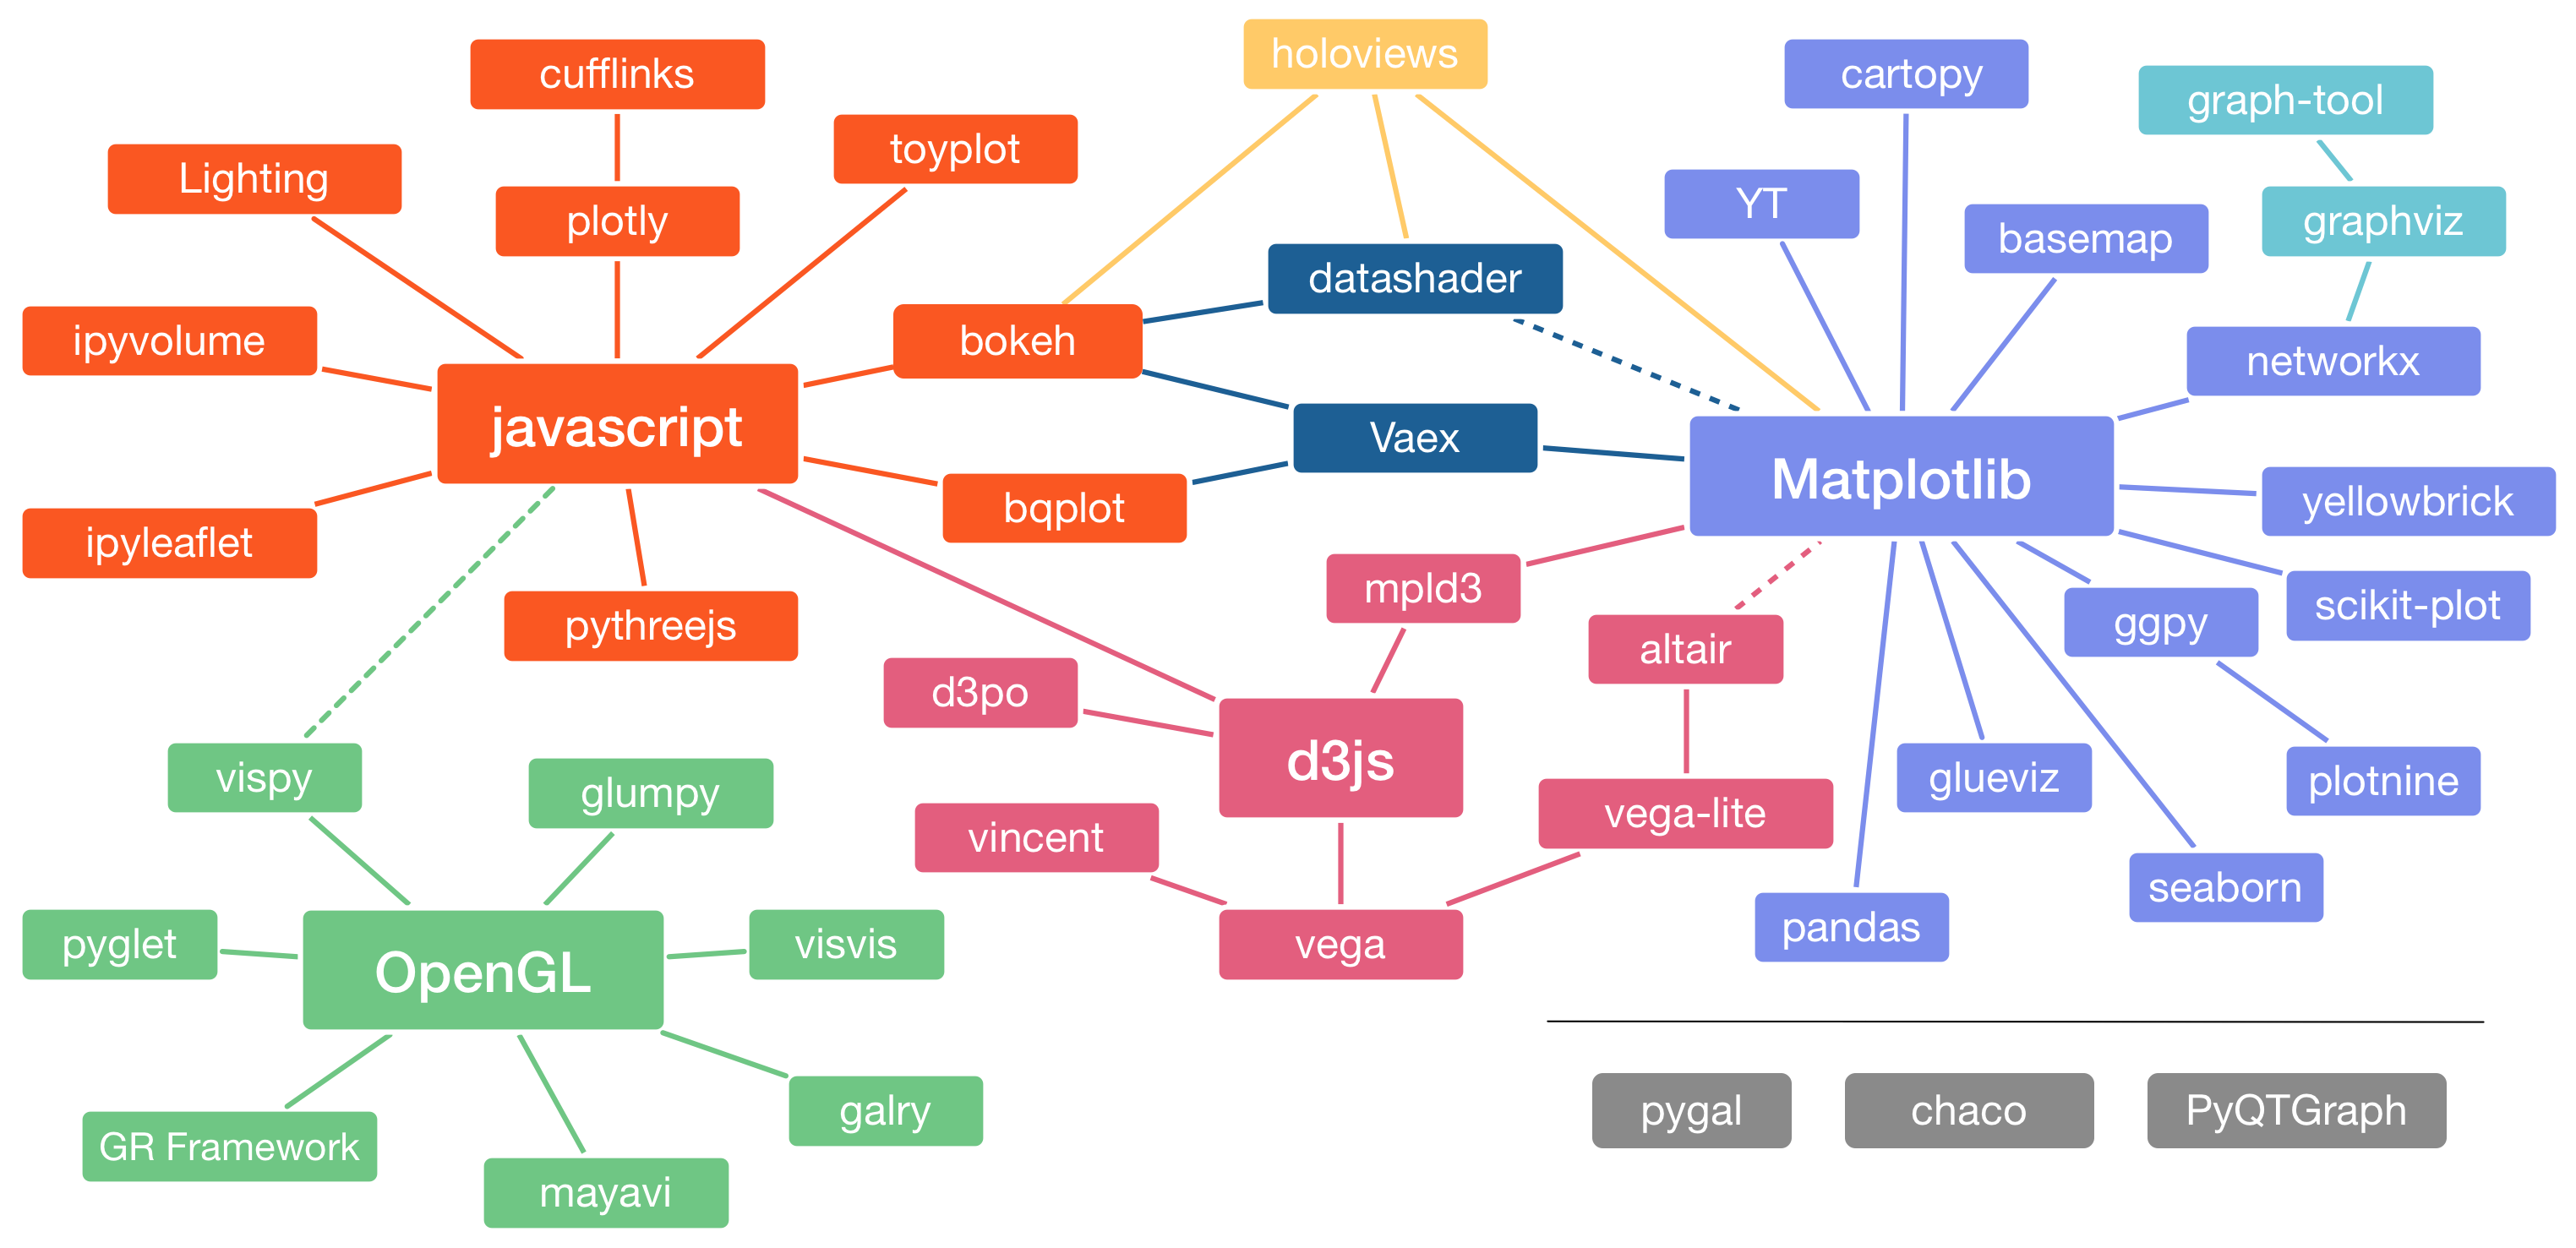 cidr-data-visualization/data_visualization_filled ipynb